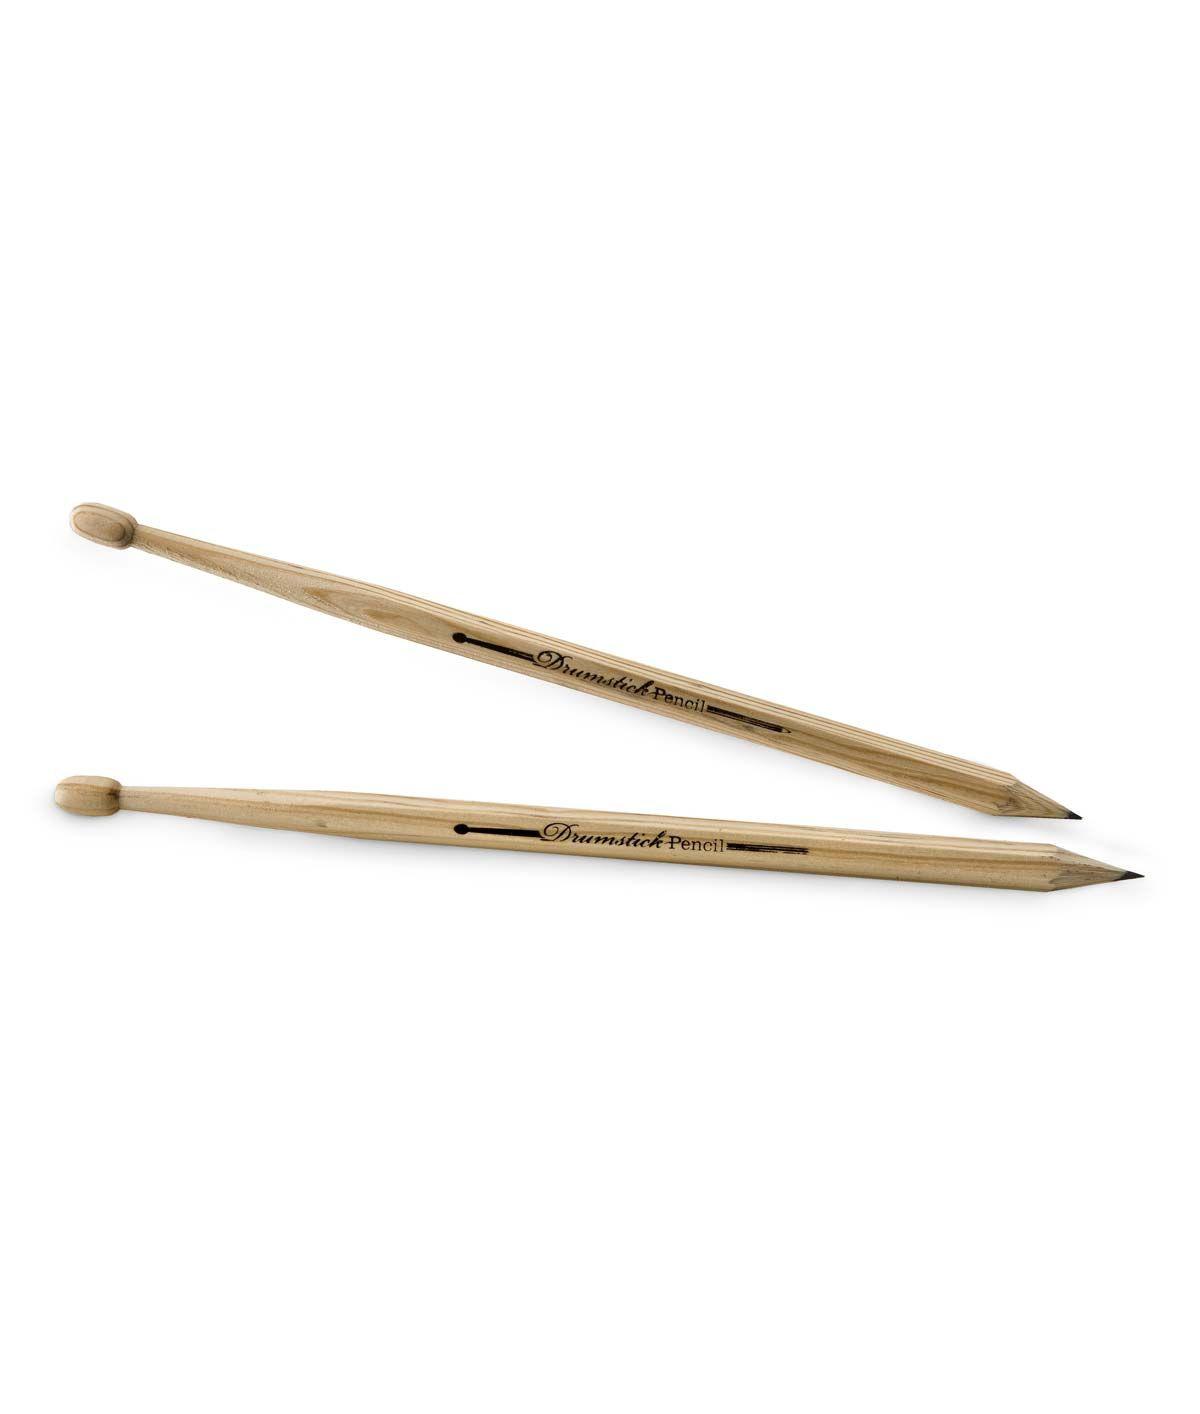 Drumstick Pencils Stocking Stuffers For Men Stocking Stuffers